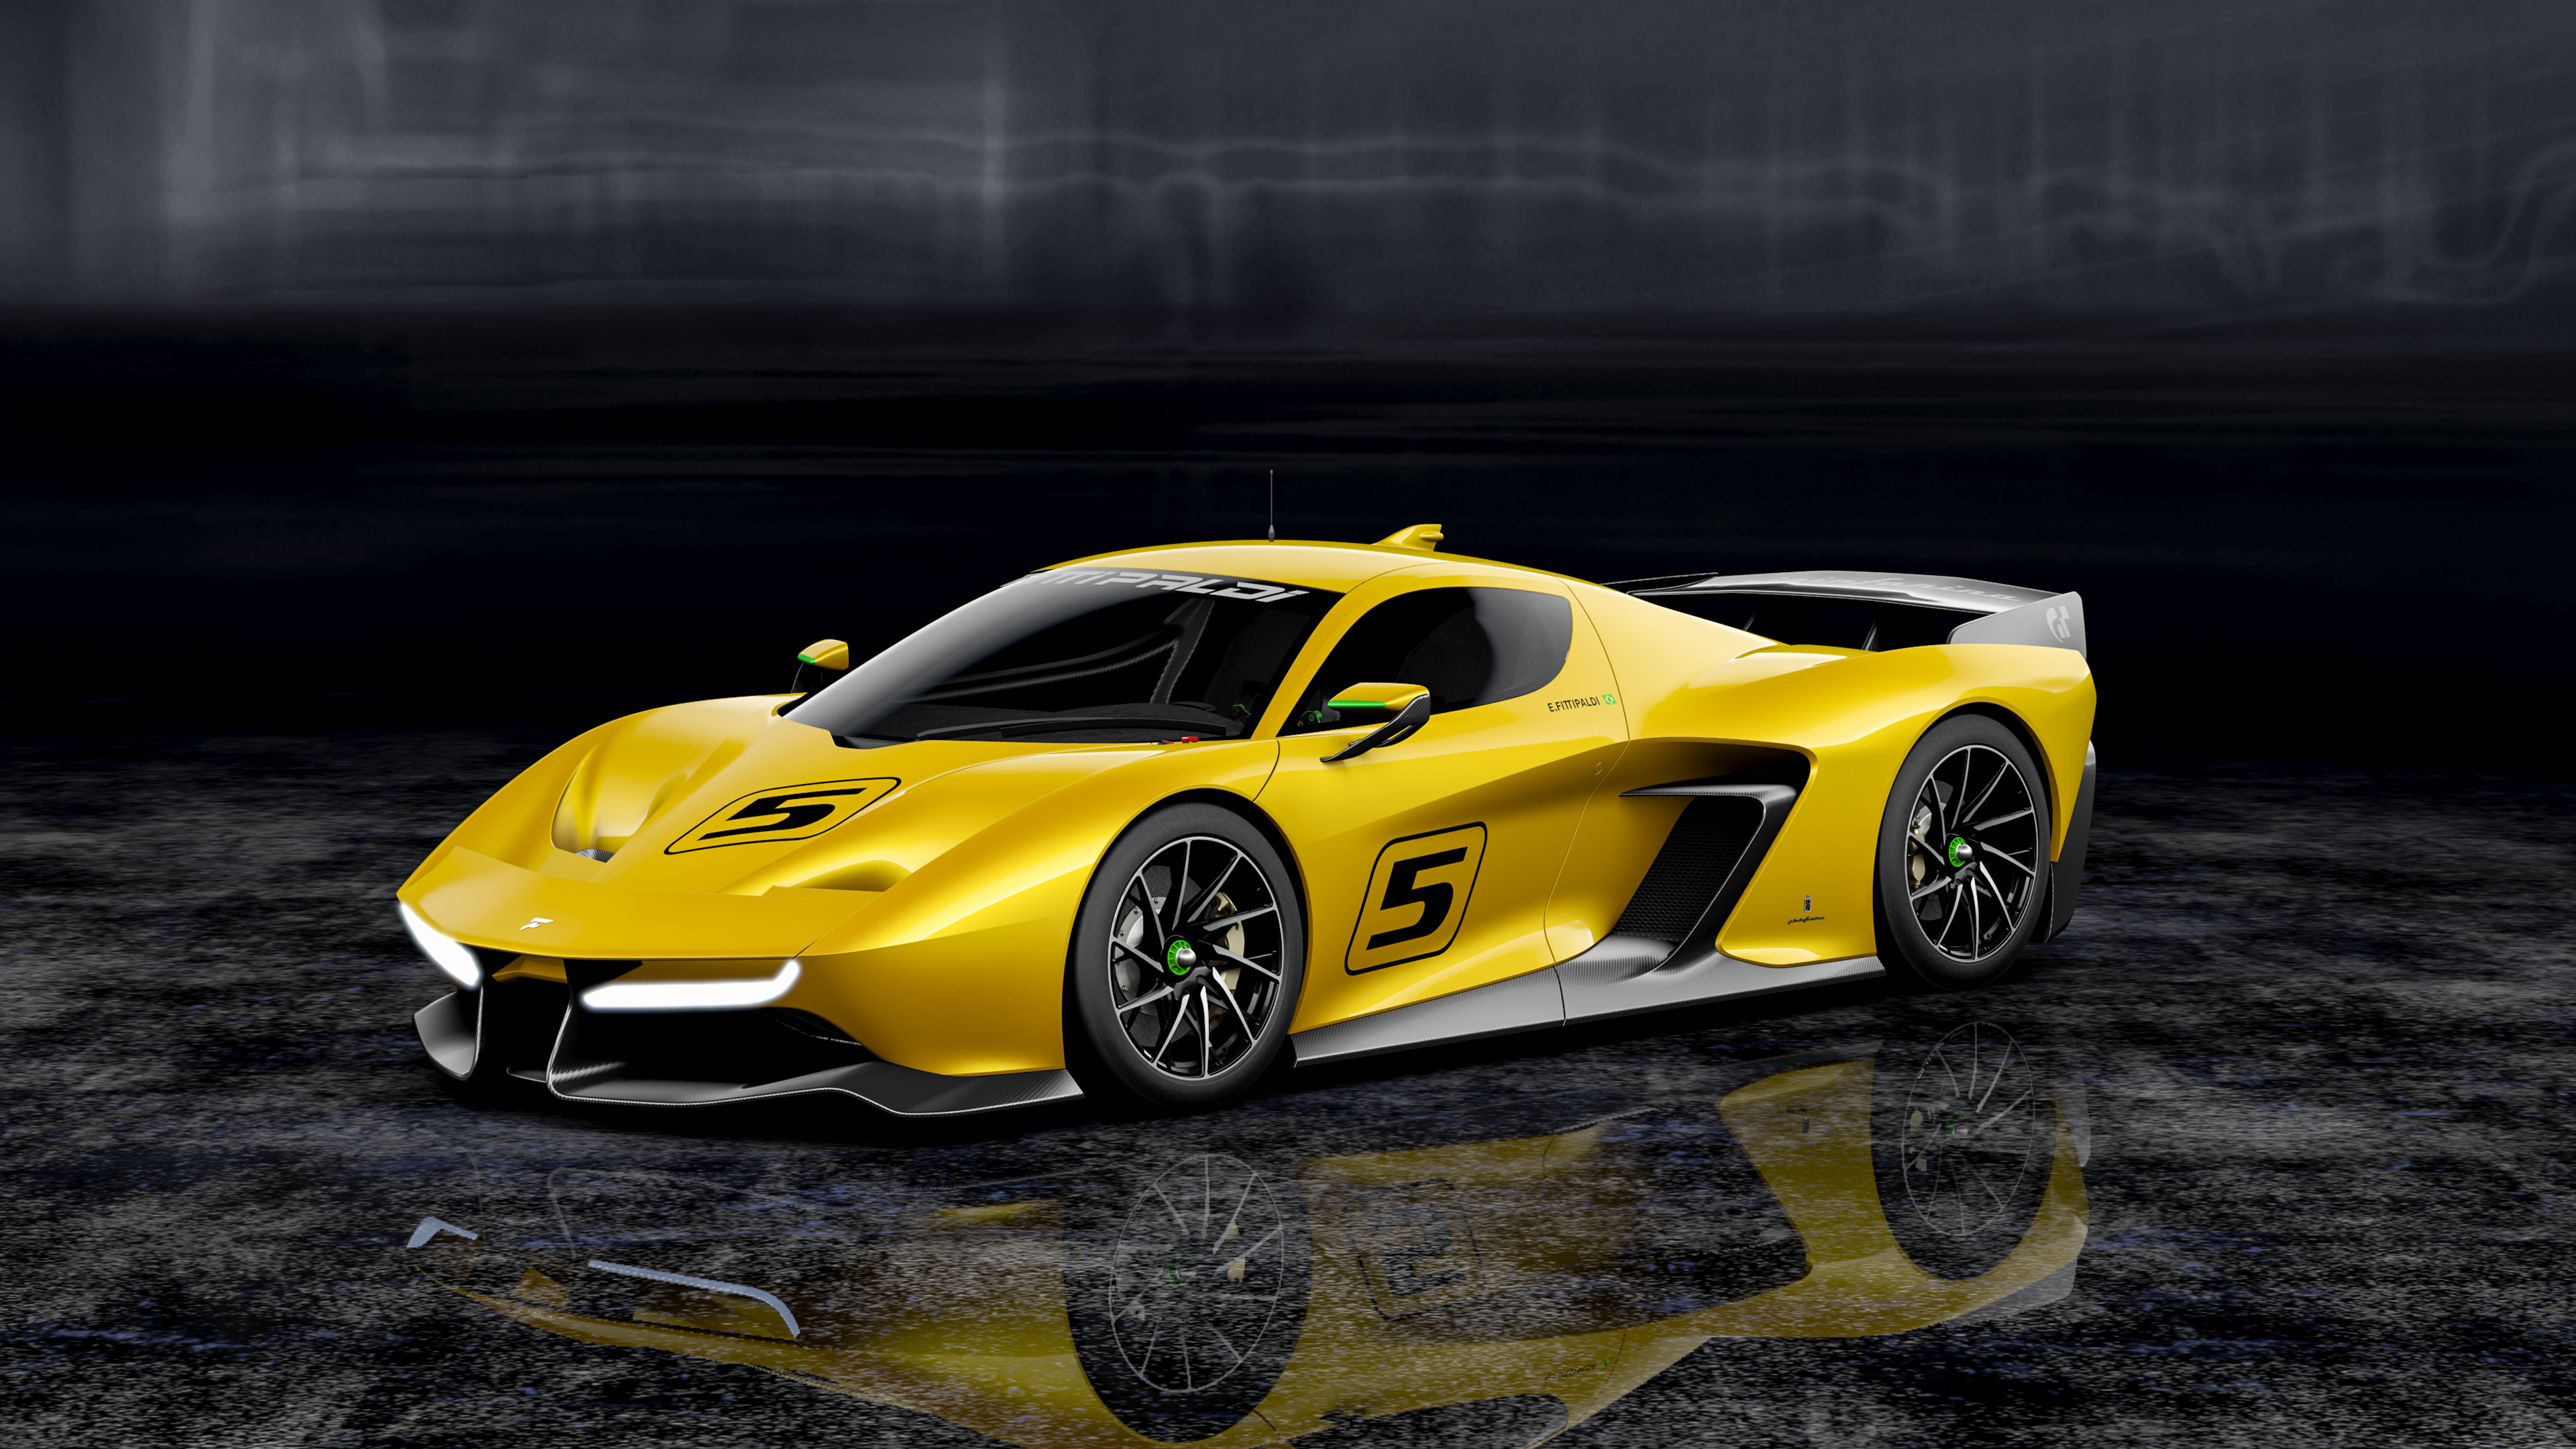 Fittipaldi ef7 vision grand turismo 4k. обои скачать